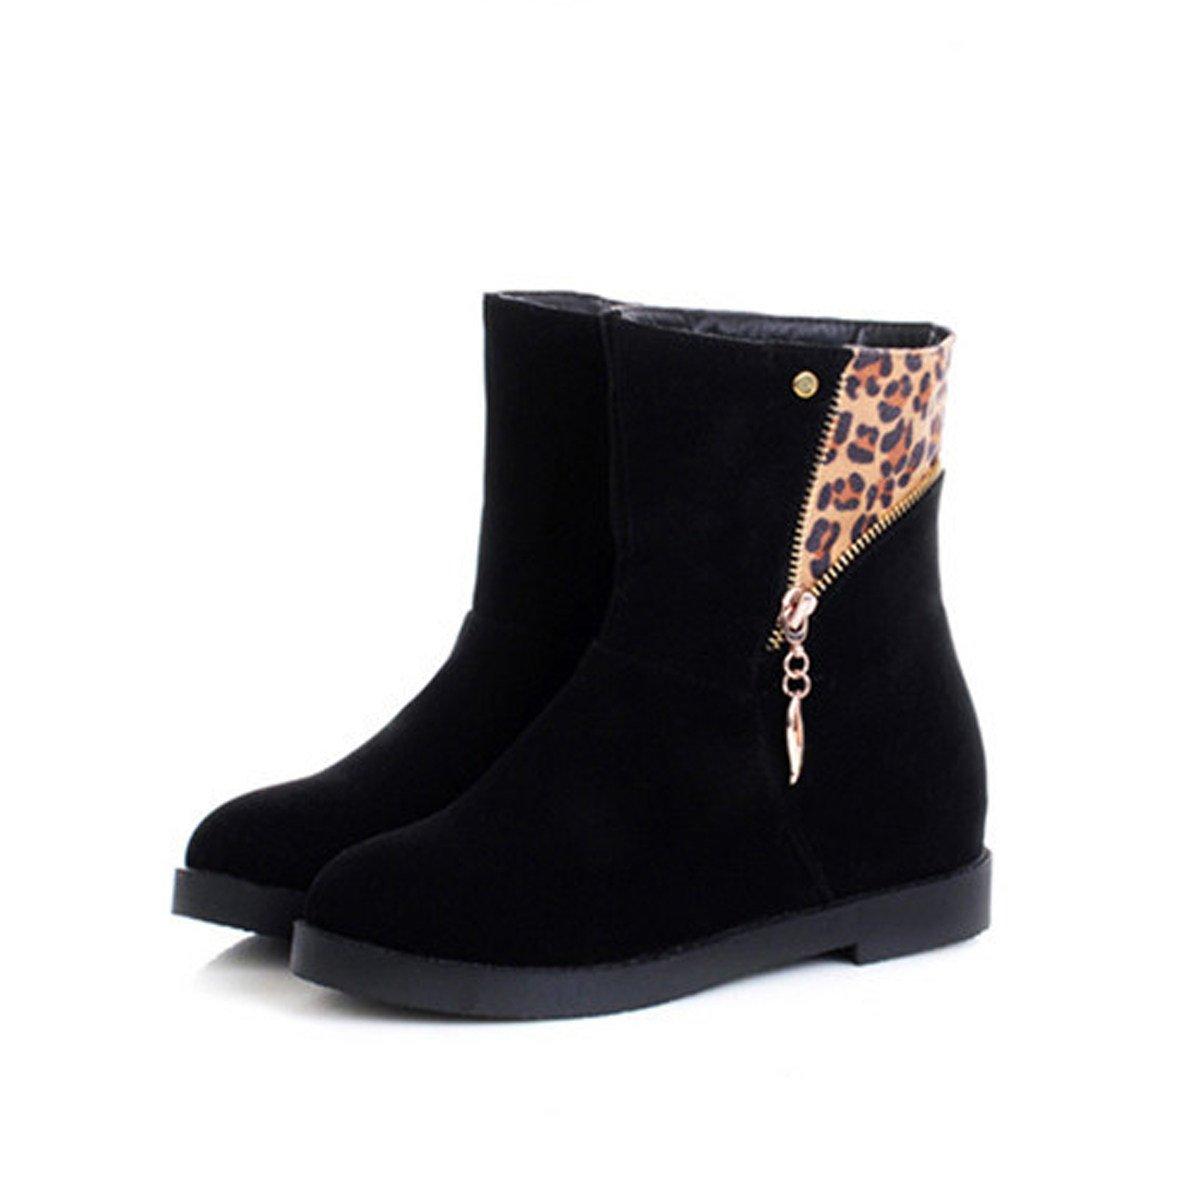 WJNKK En Femmes Dames Zipper Plate Bottines Chaussures En WJNKK Daim Faux Caoutchouc FunkyB076H4CGZCParent e0e296